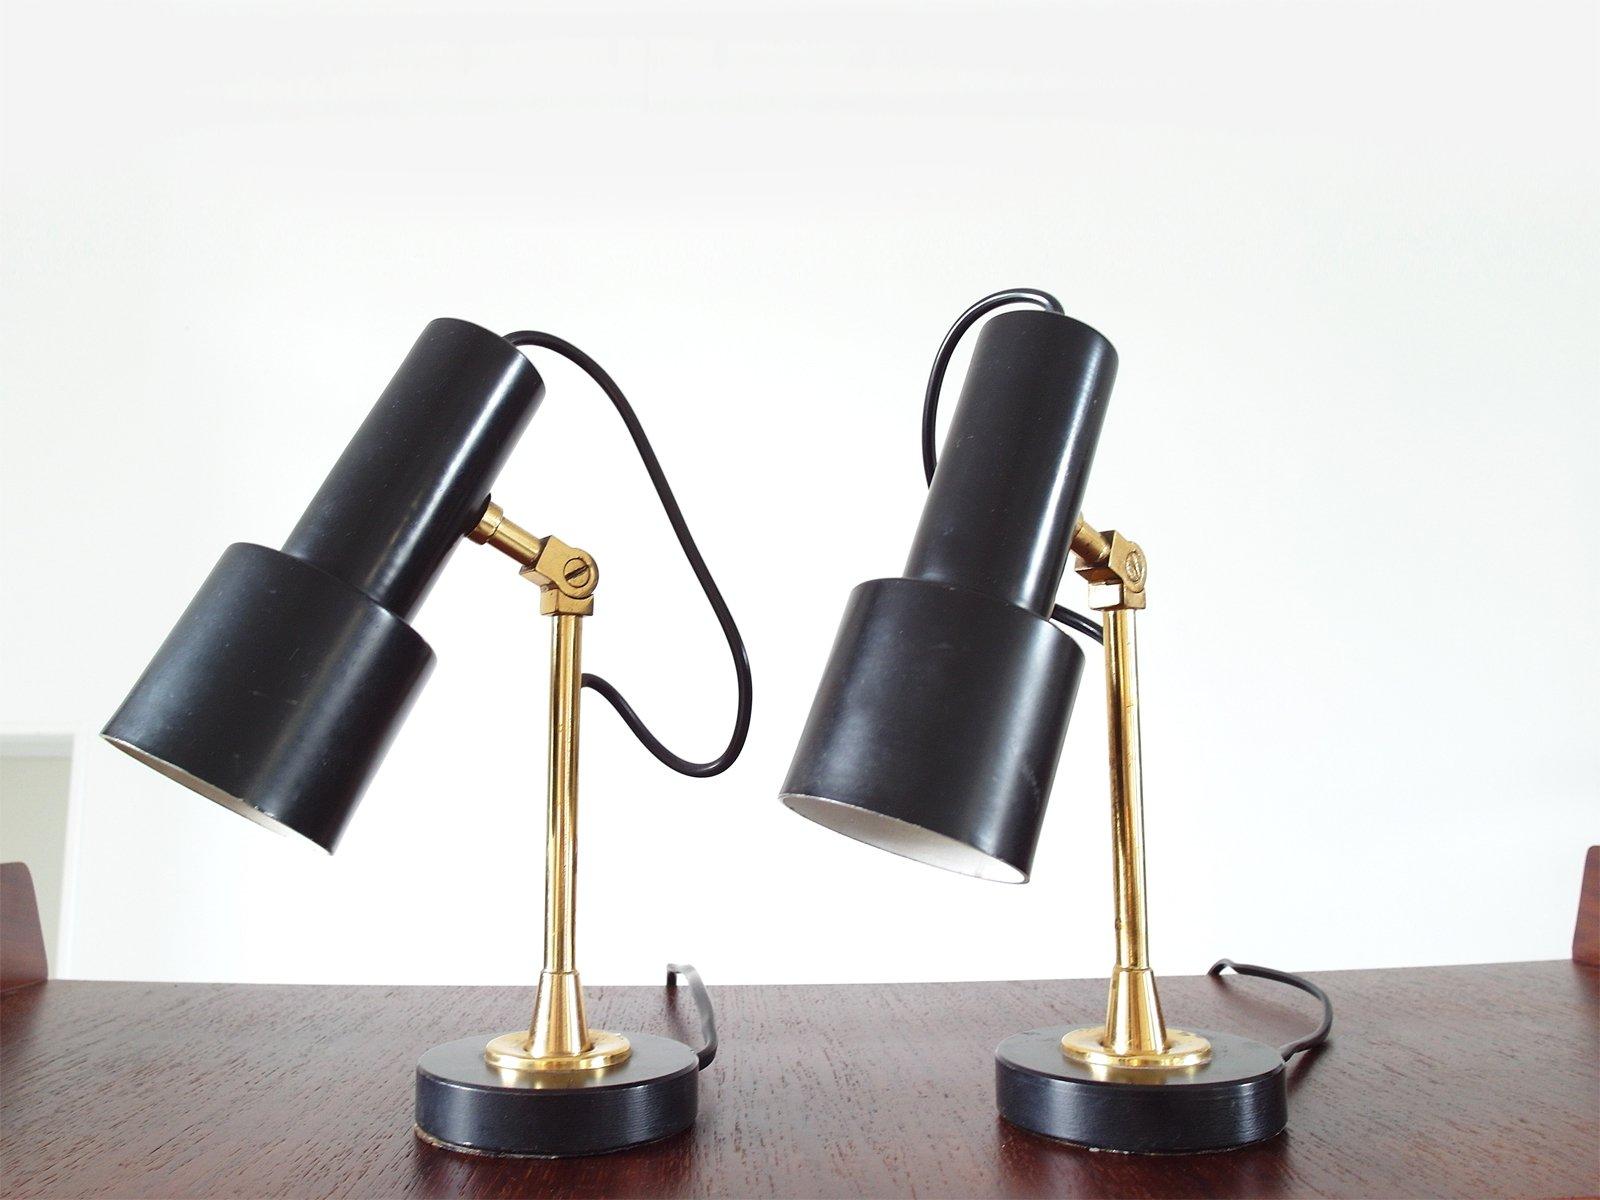 Messing Tischlampen von Stilnovo, 1950er, 2er Set